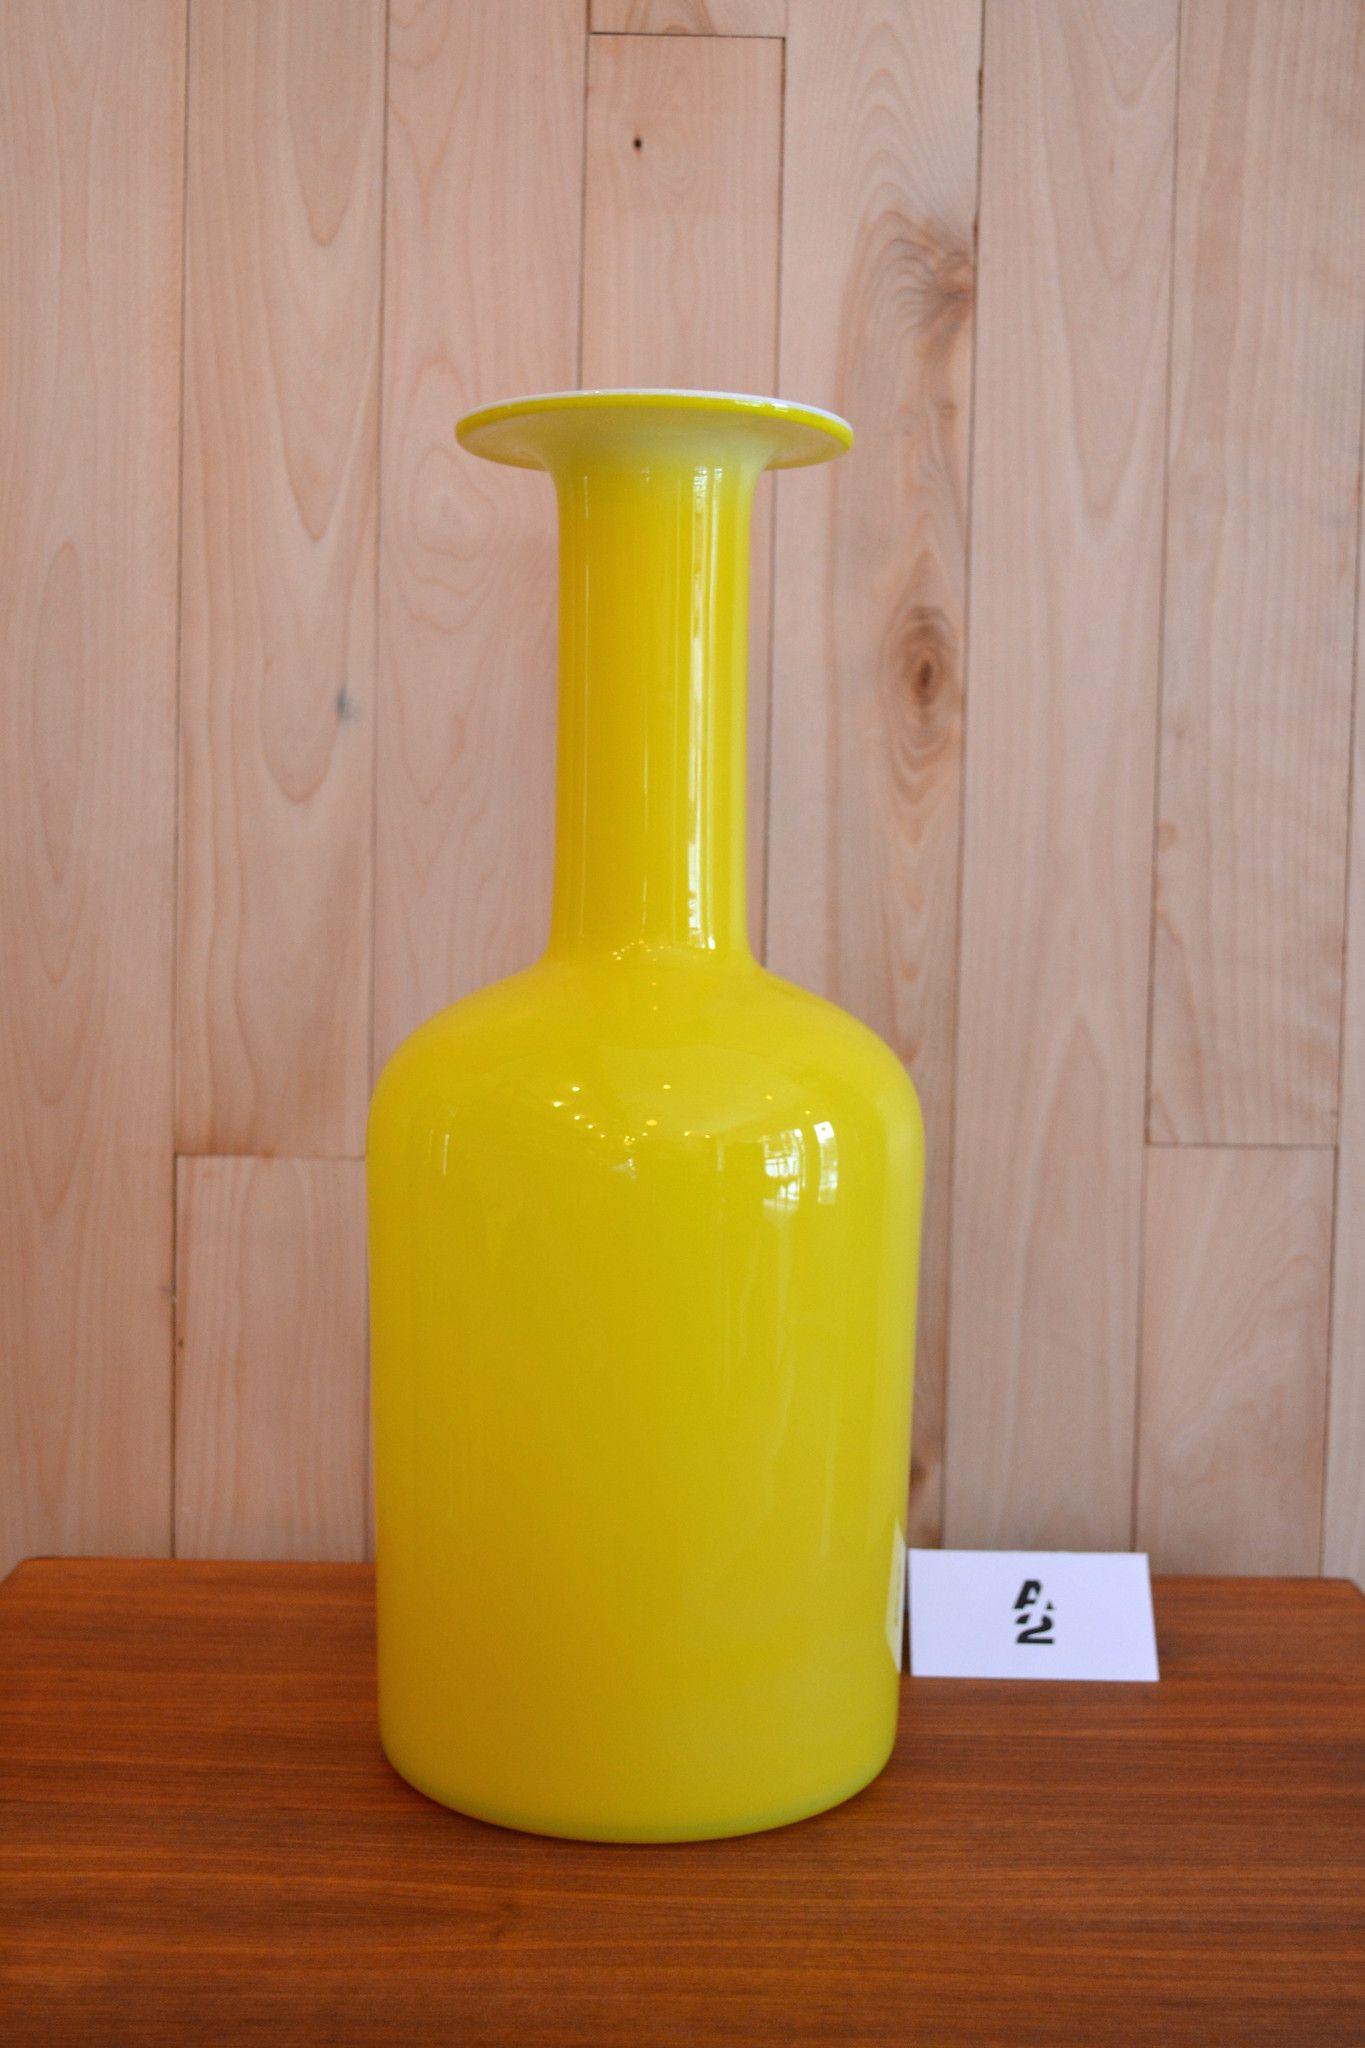 Mid century modern vase holmegaard gulvvase objets pinterest mid century modern vase holmegaard gulvvase reviewsmspy